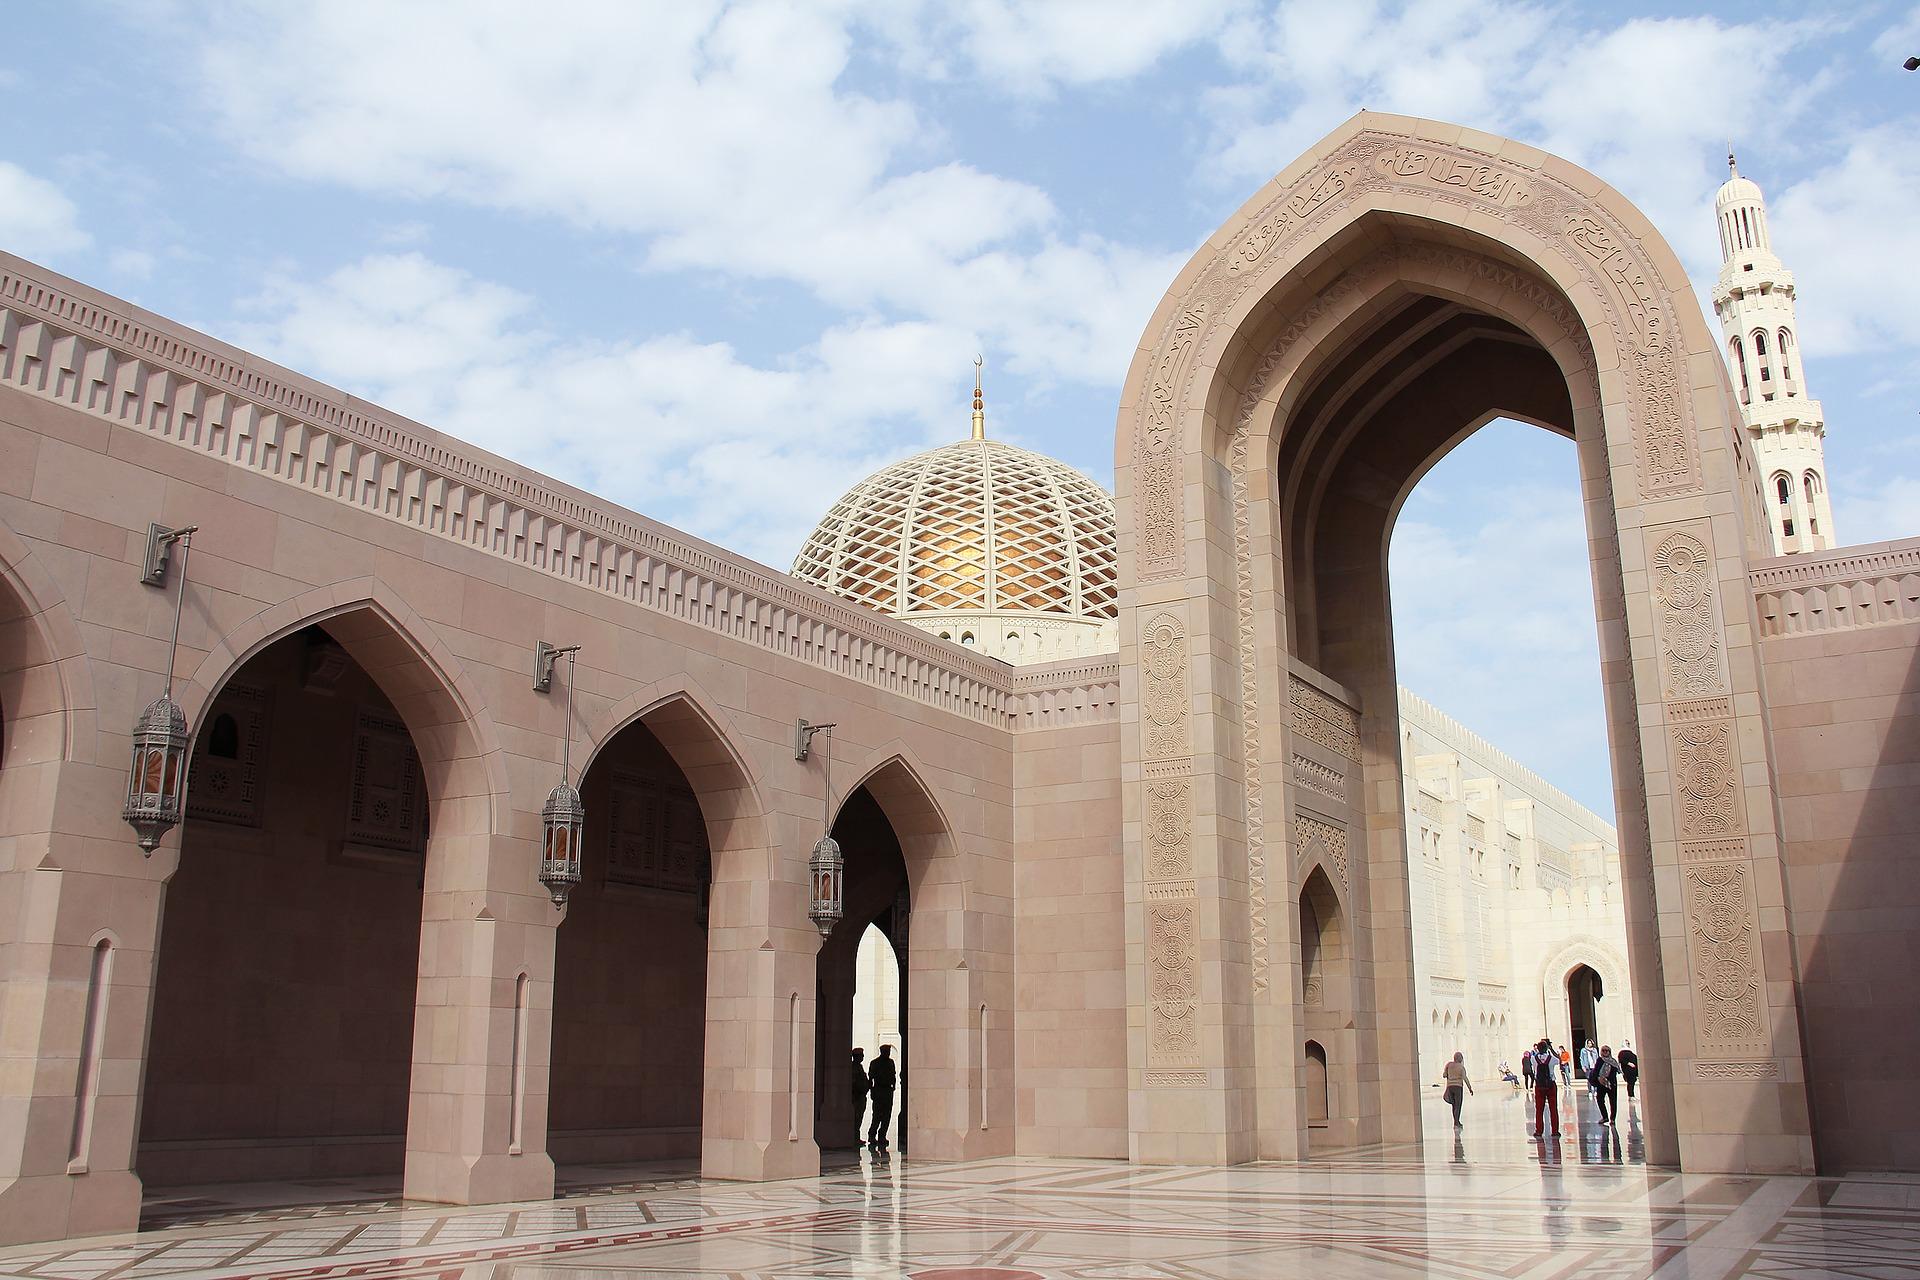 Legalizzazione di documenti russi per l'Oman